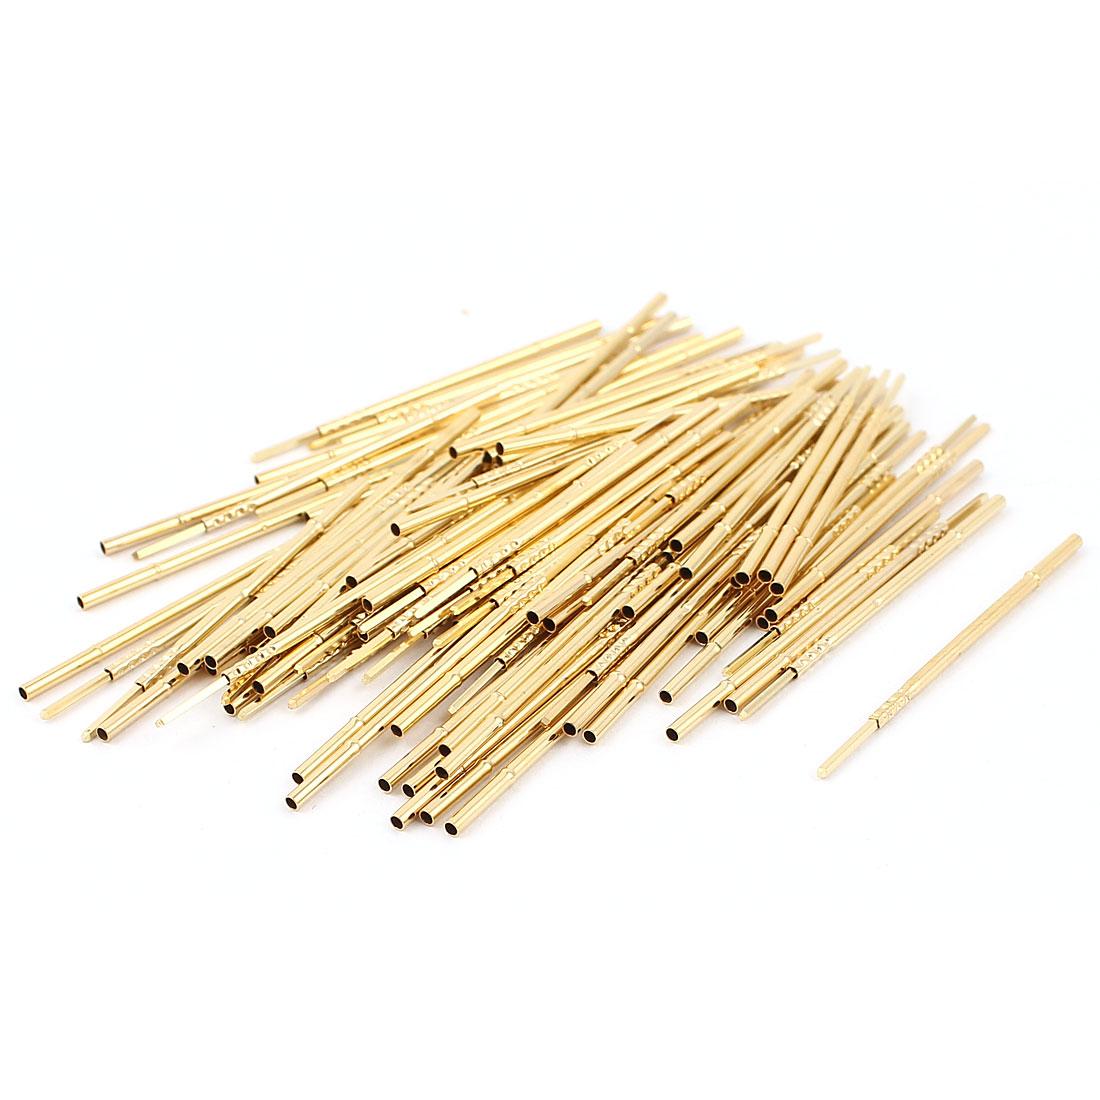 100 Pcs PL75-4W 1.3mm Dia Testing Probe Pin Receptacles Gold Tone